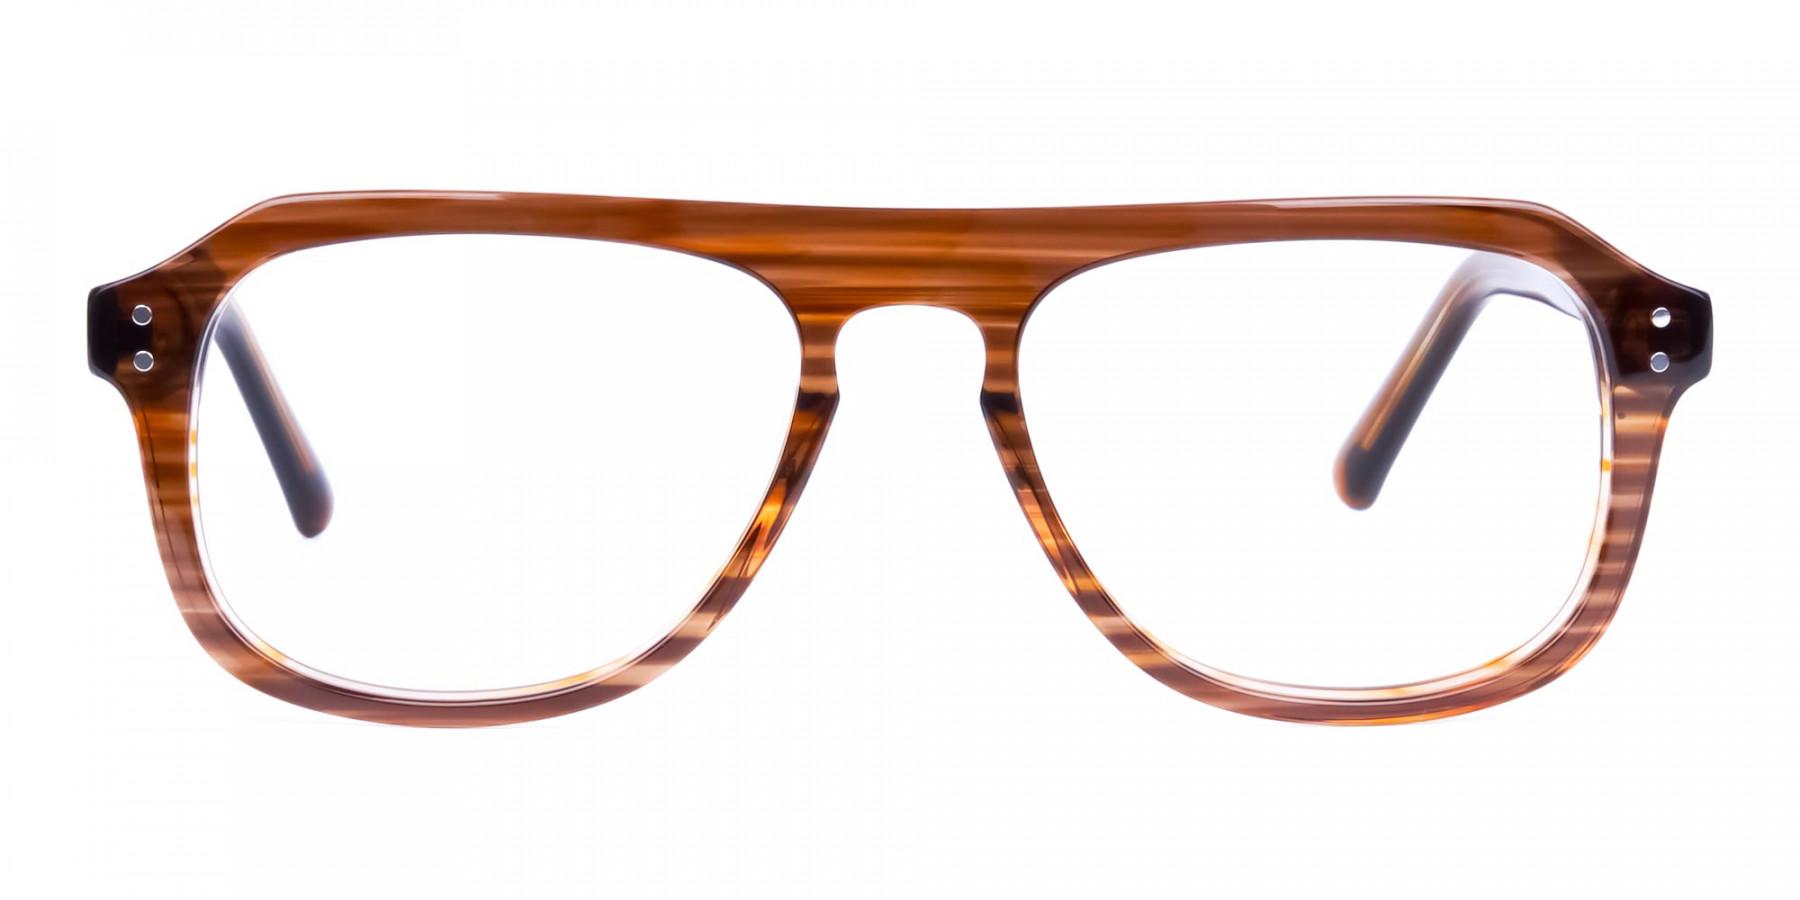 Hazelnut-Brown-Aviator-Glasses-Frame-1